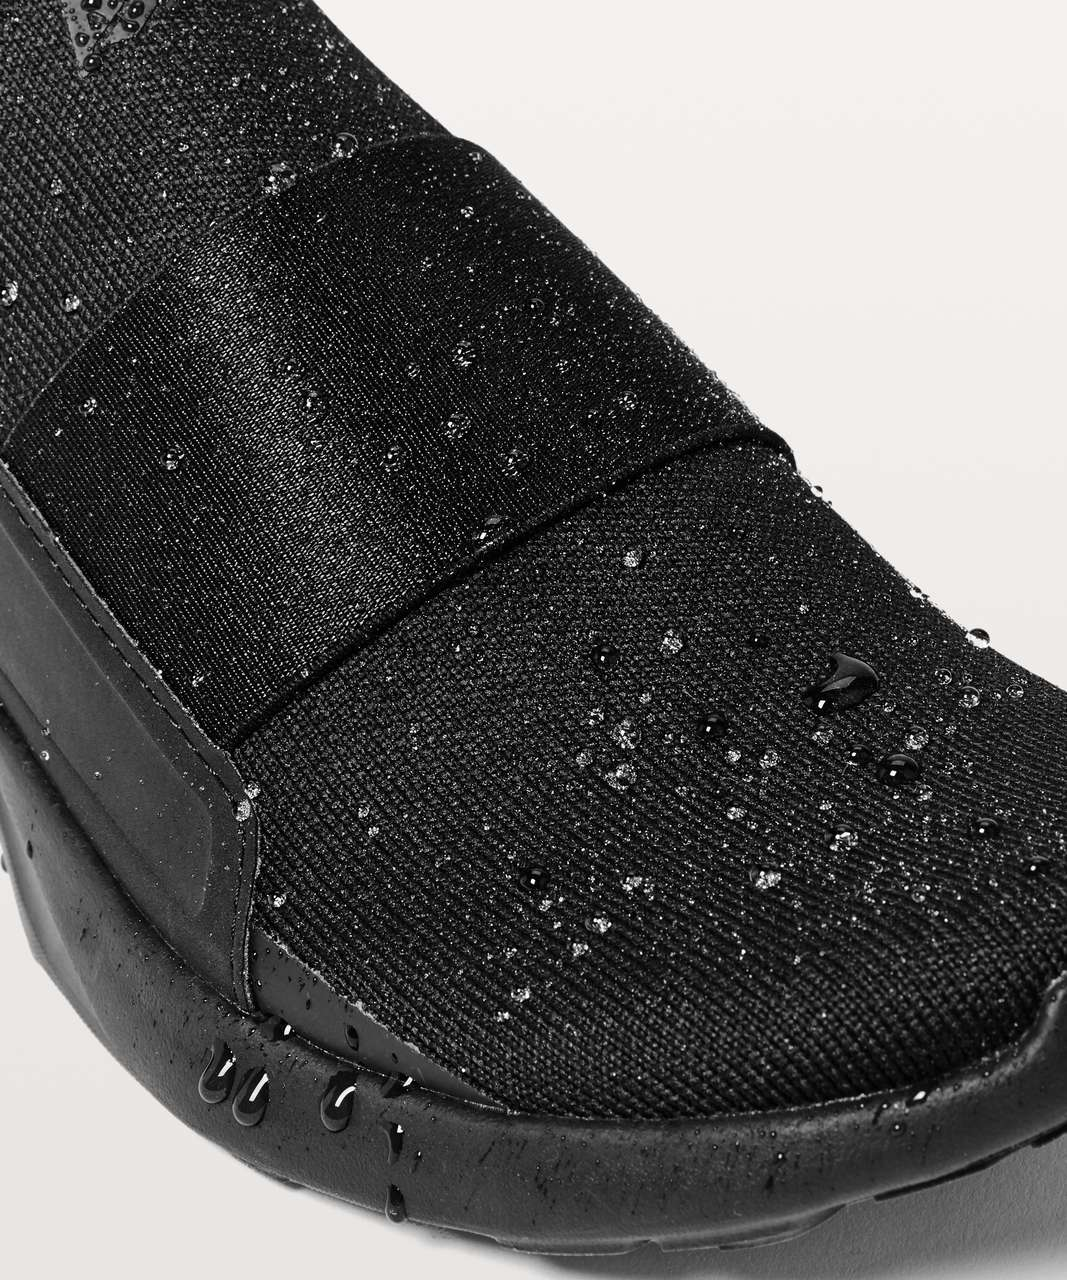 Lululemon Womens Bliss Water Resistant Shoe - Black / Black